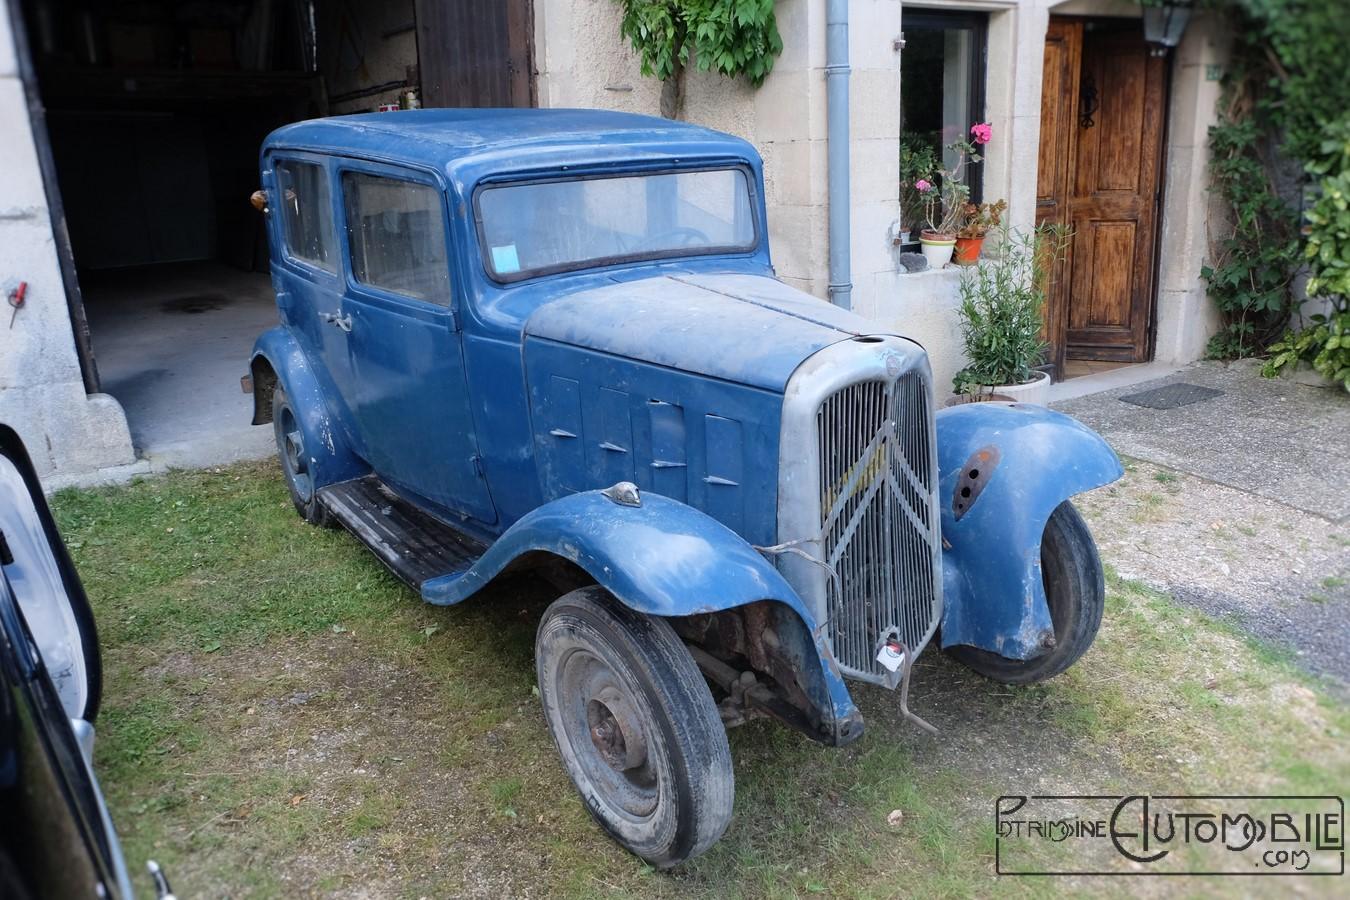 citro n rosalie 10al de 1933 en sortie de grange patrimoine automobile com. Black Bedroom Furniture Sets. Home Design Ideas